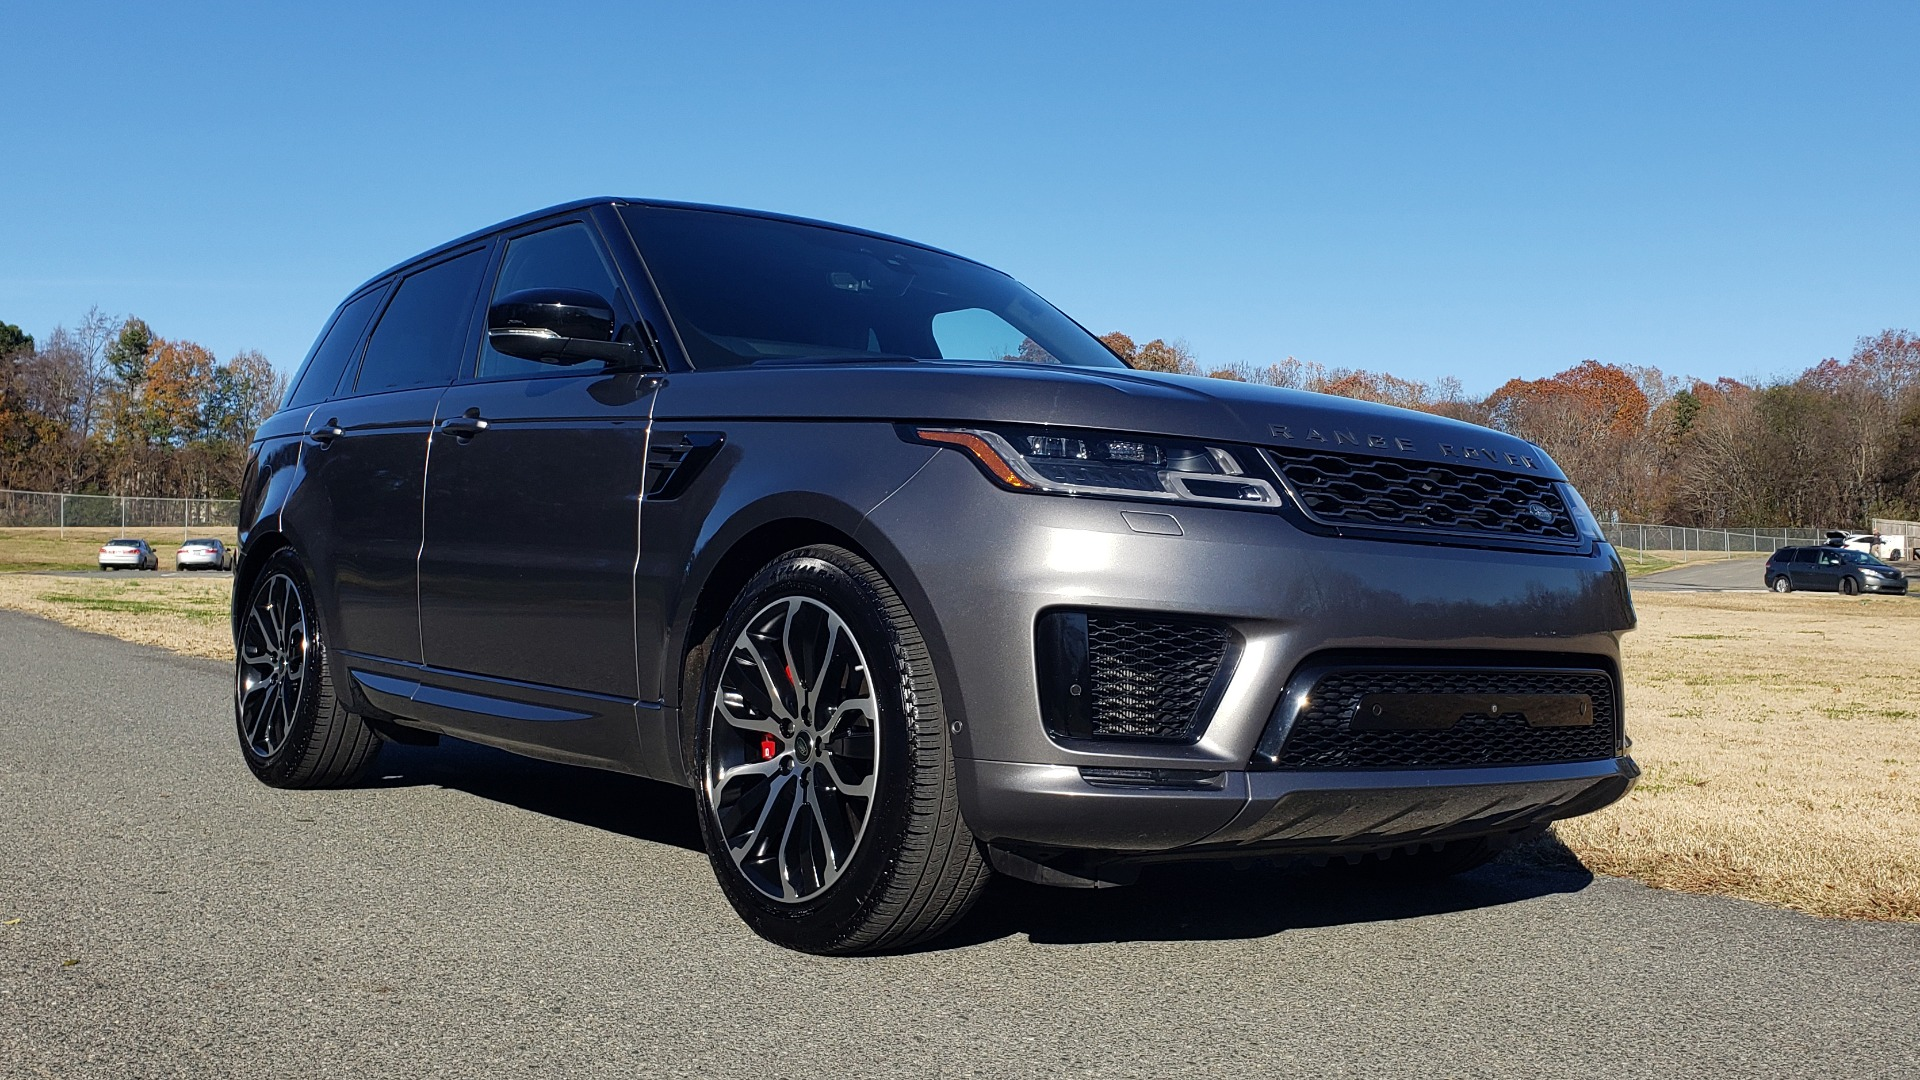 Used 2018 Land Rover RANGE ROVER SPORT DYNAMIC SC V8 / CLIMATE CMFRT / VISION ASST / MERIDIAN for sale Sold at Formula Imports in Charlotte NC 28227 2